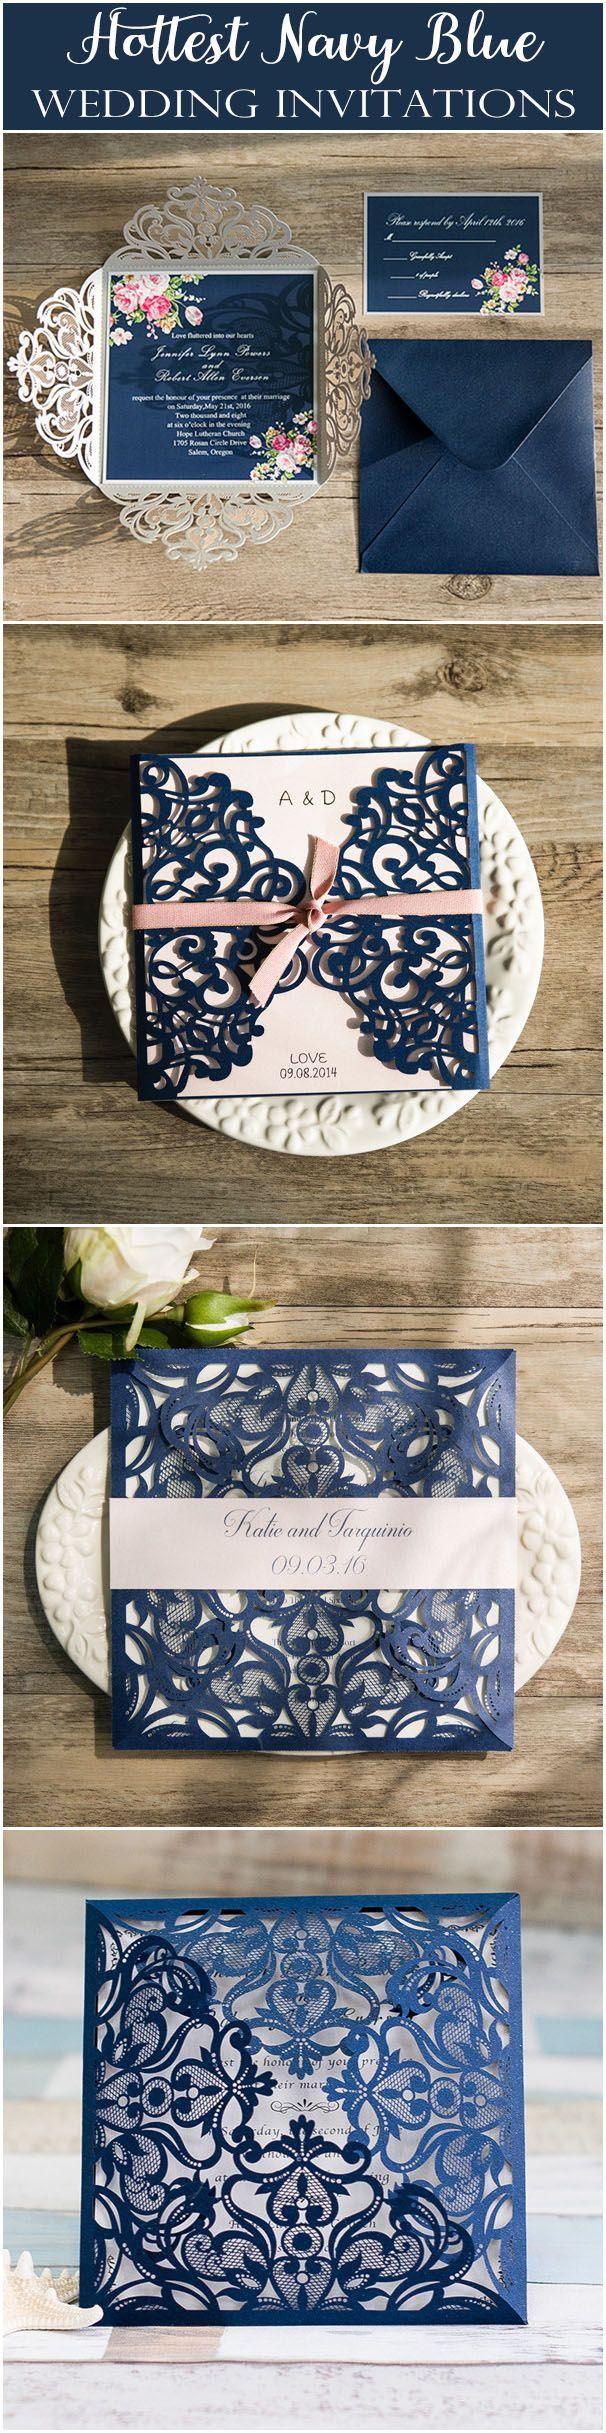 most popular navy blue wedding invitations @elegantwinvites